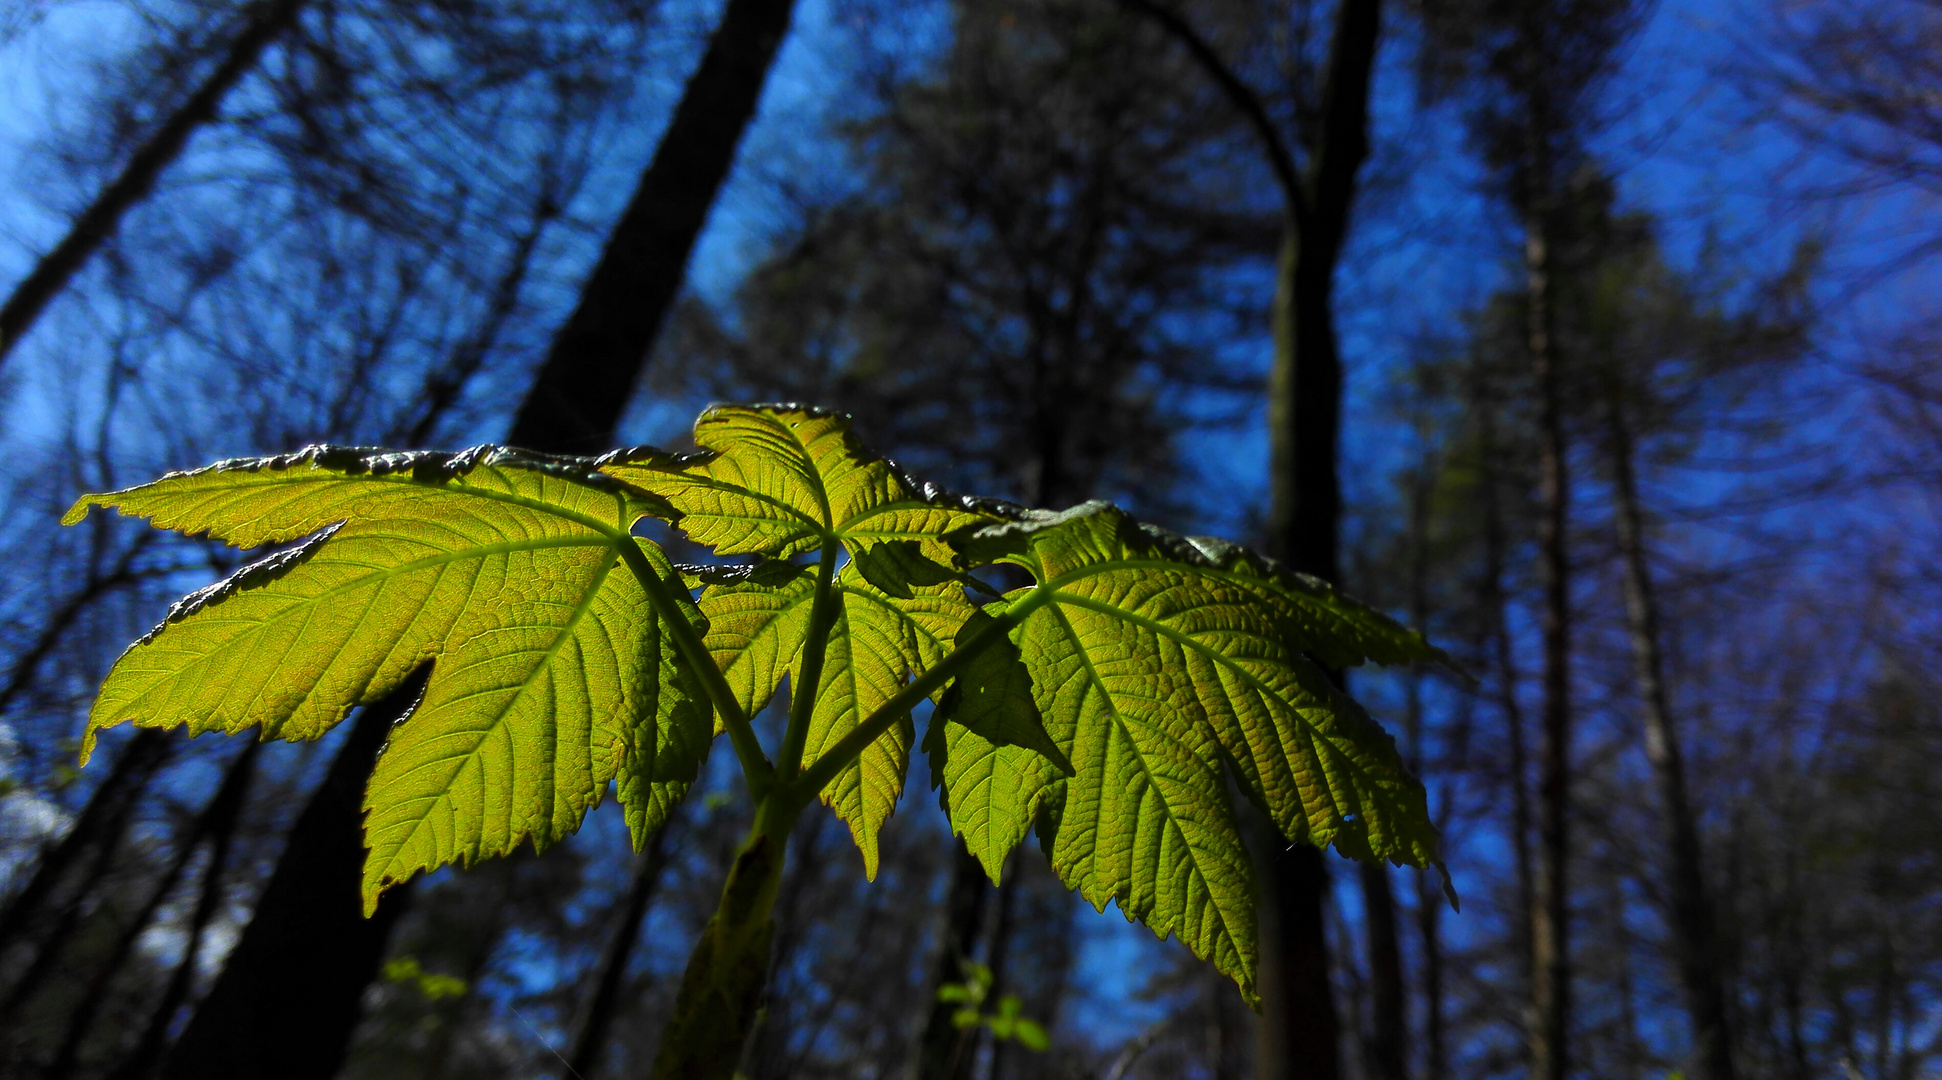 Sonnenblatt Foto & Bild | techniken, kamera-techniken, handy-fotos ...